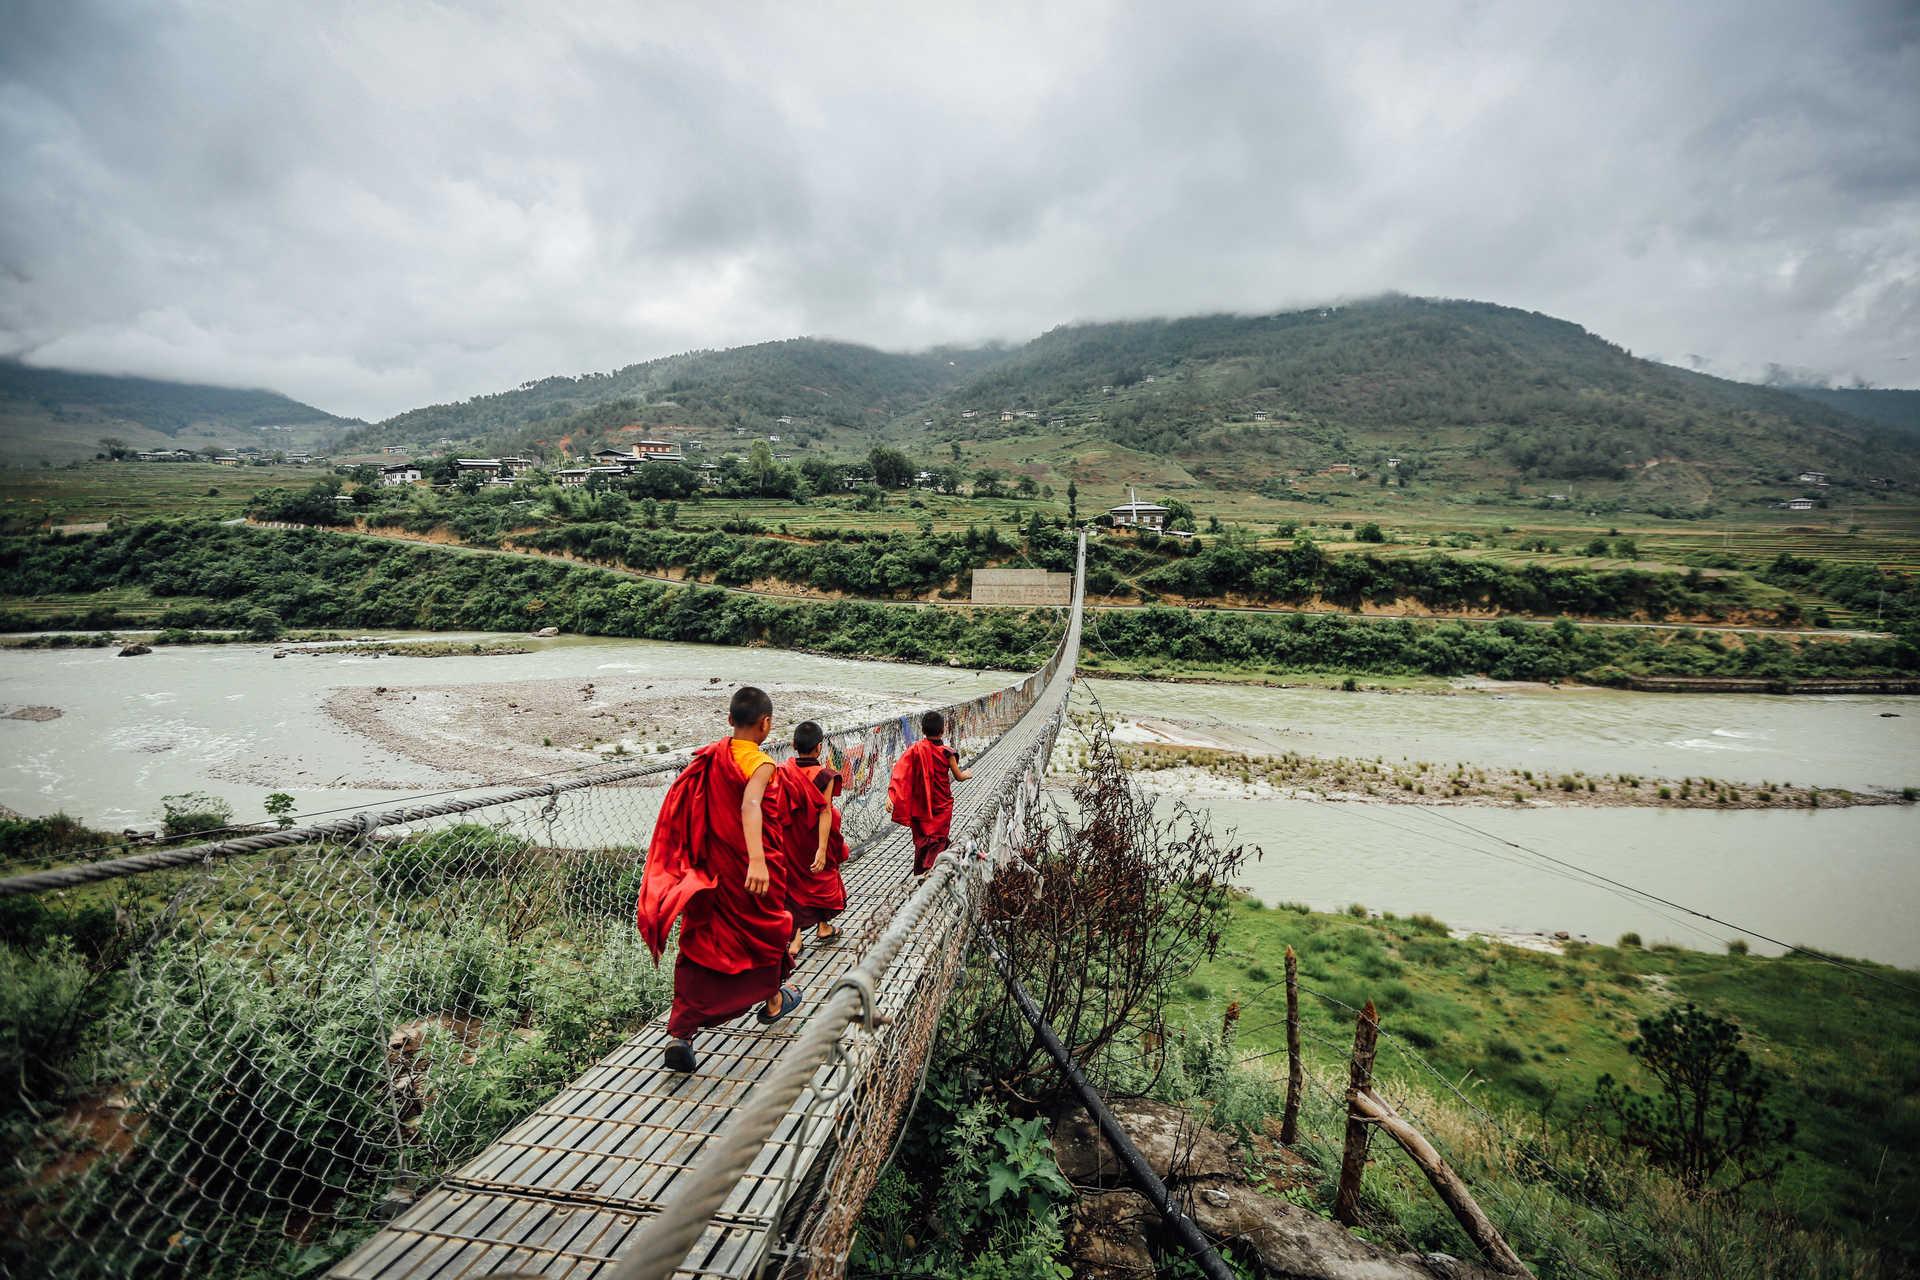 Young monks walking on a rope bridge in Bhutan